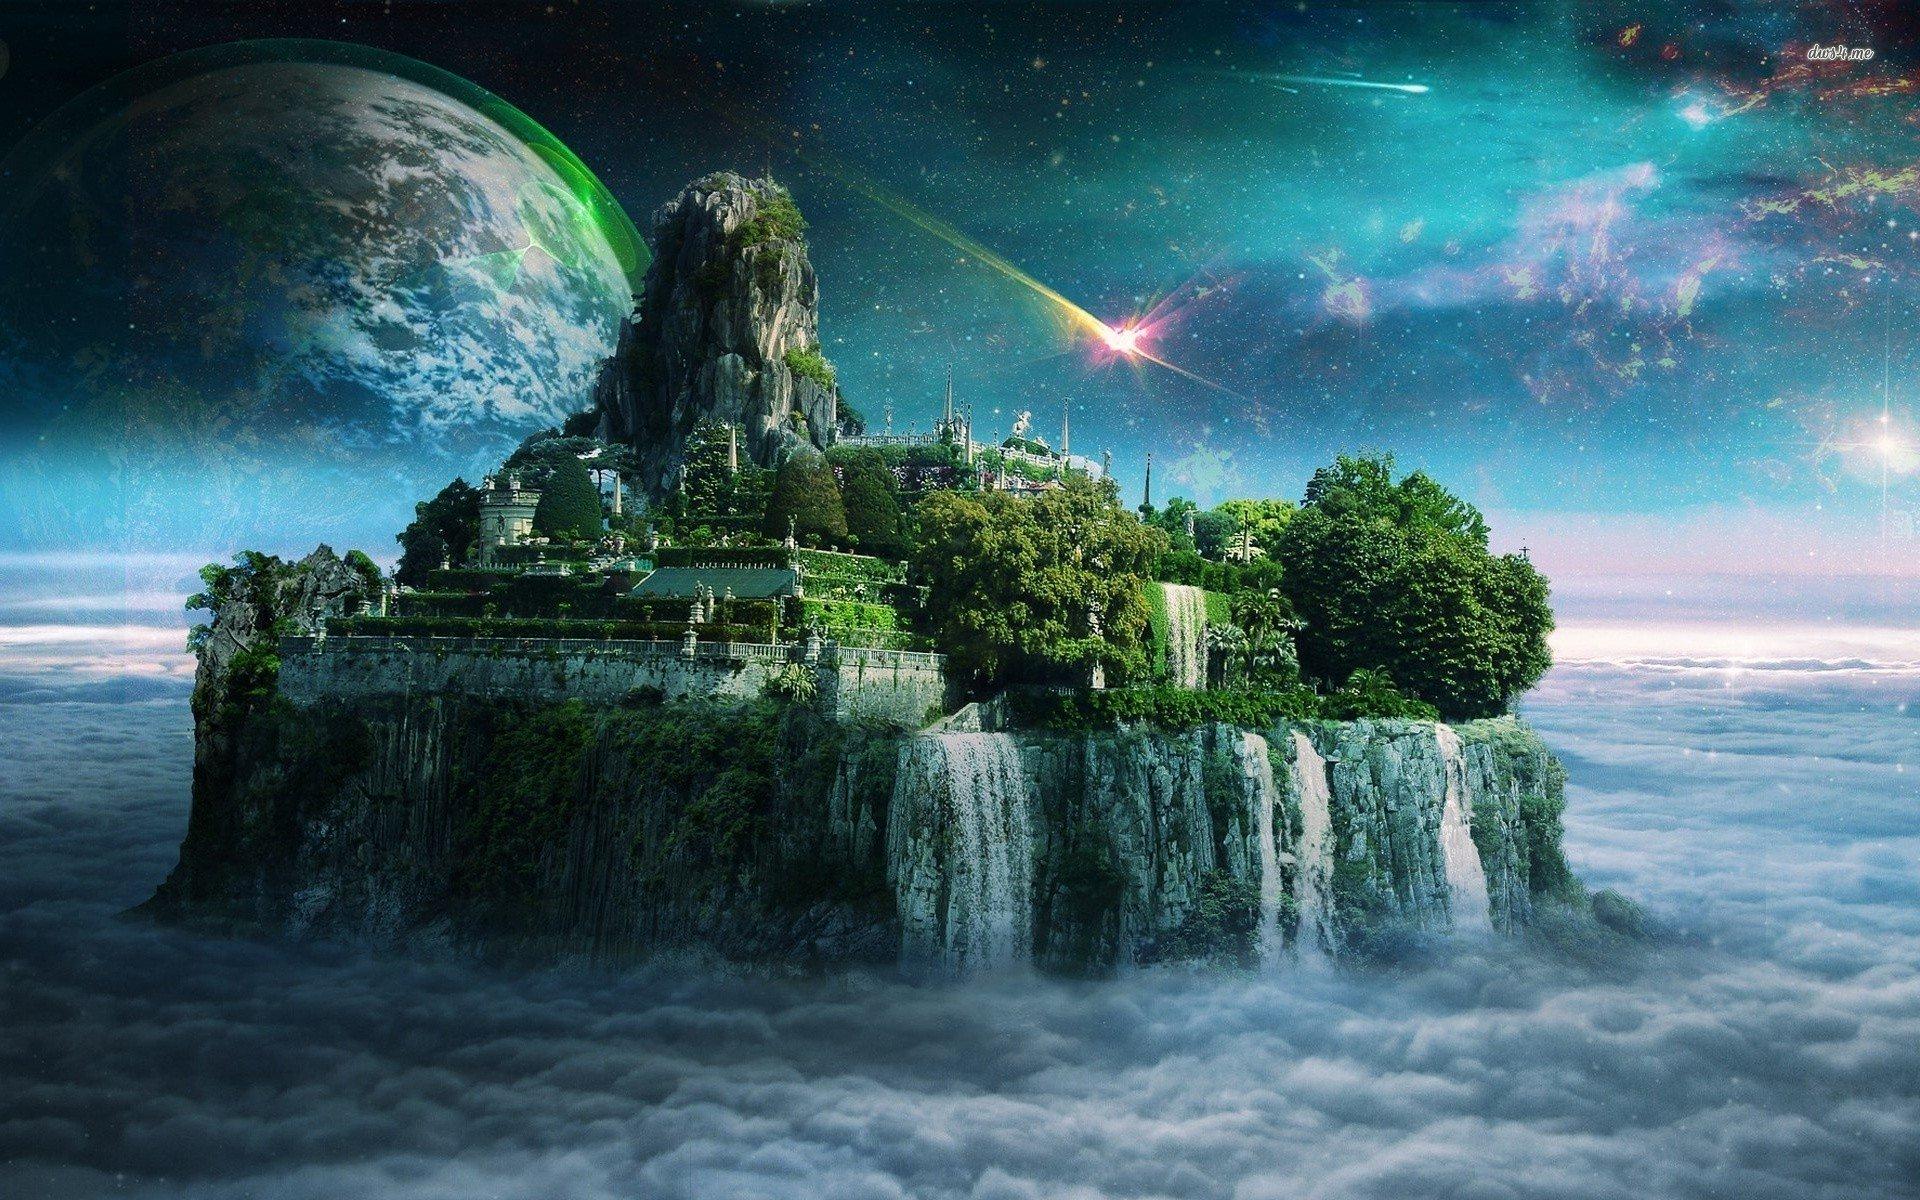 island-sky-cloud-kingdom-planet.jpg